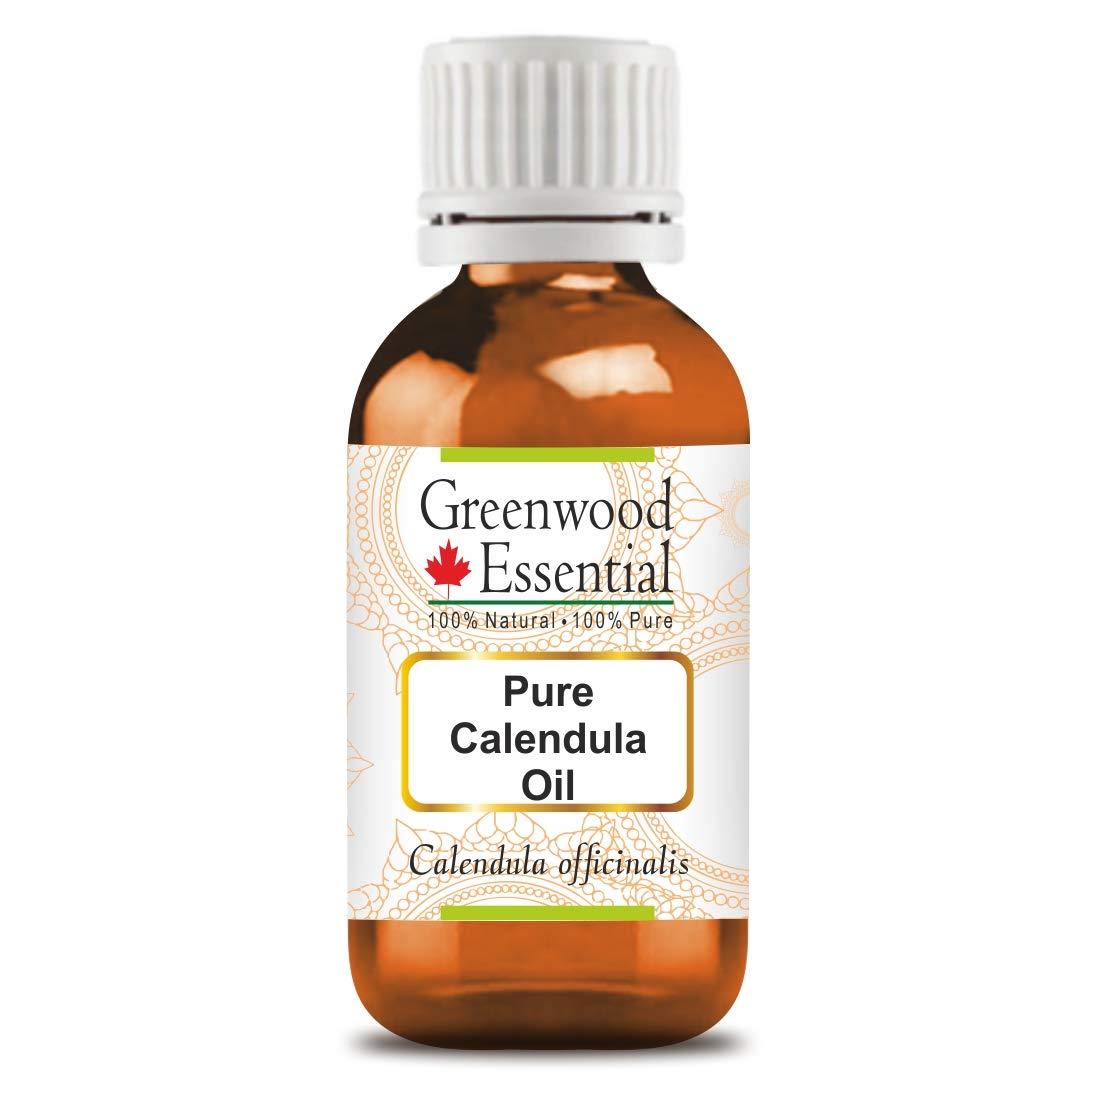 Greenwood Essential Pure Calendula Oil (Calendula officinalis) Premium Therapeutic Grade for Hair, Skin 100ml (3.38 oz)